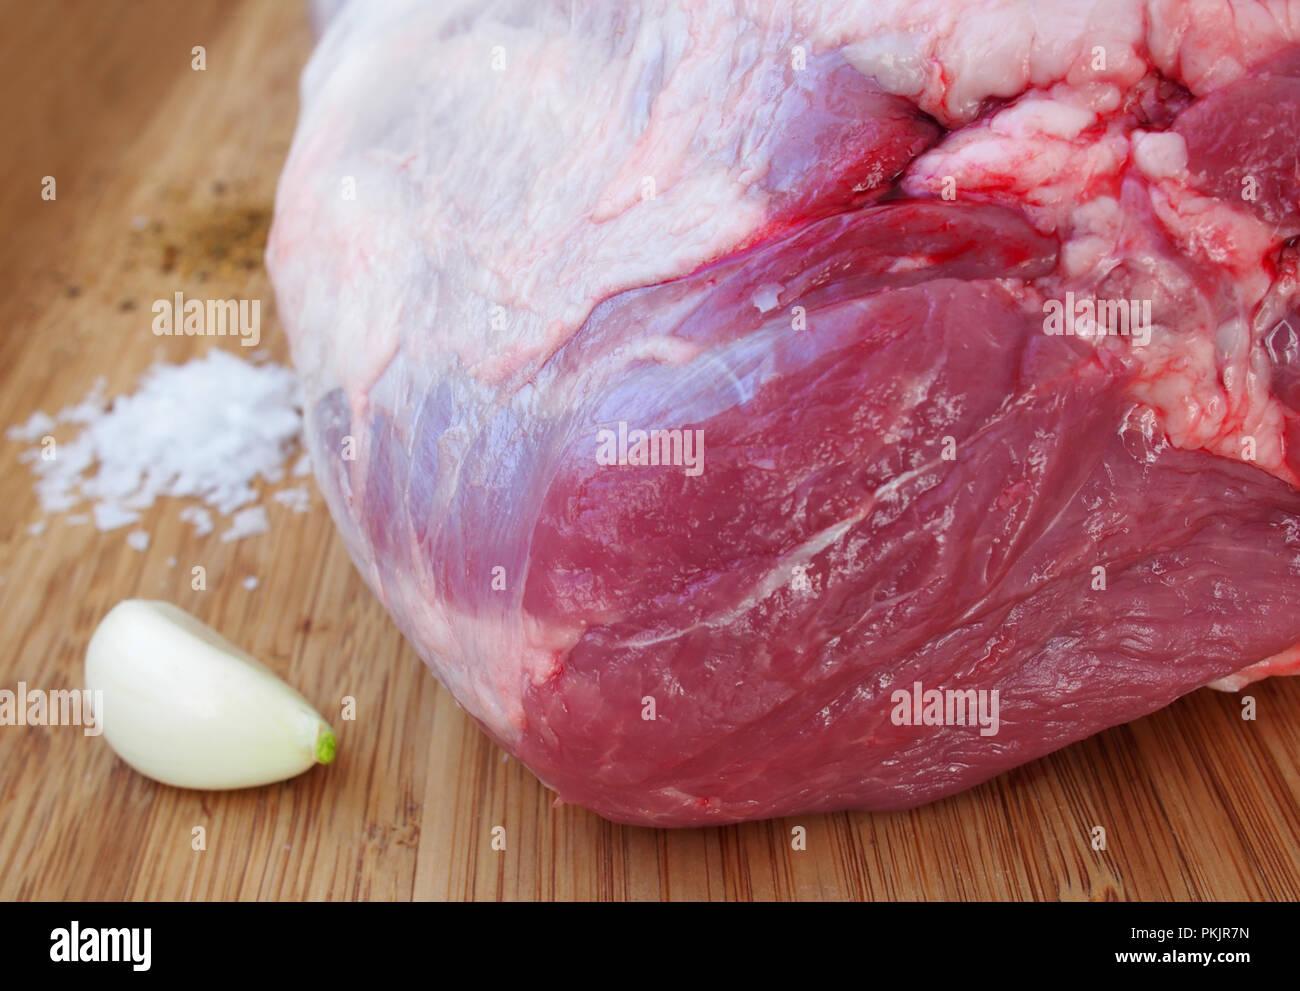 Fresh and raw meat. Leg of lamb on wood background - Stock Image